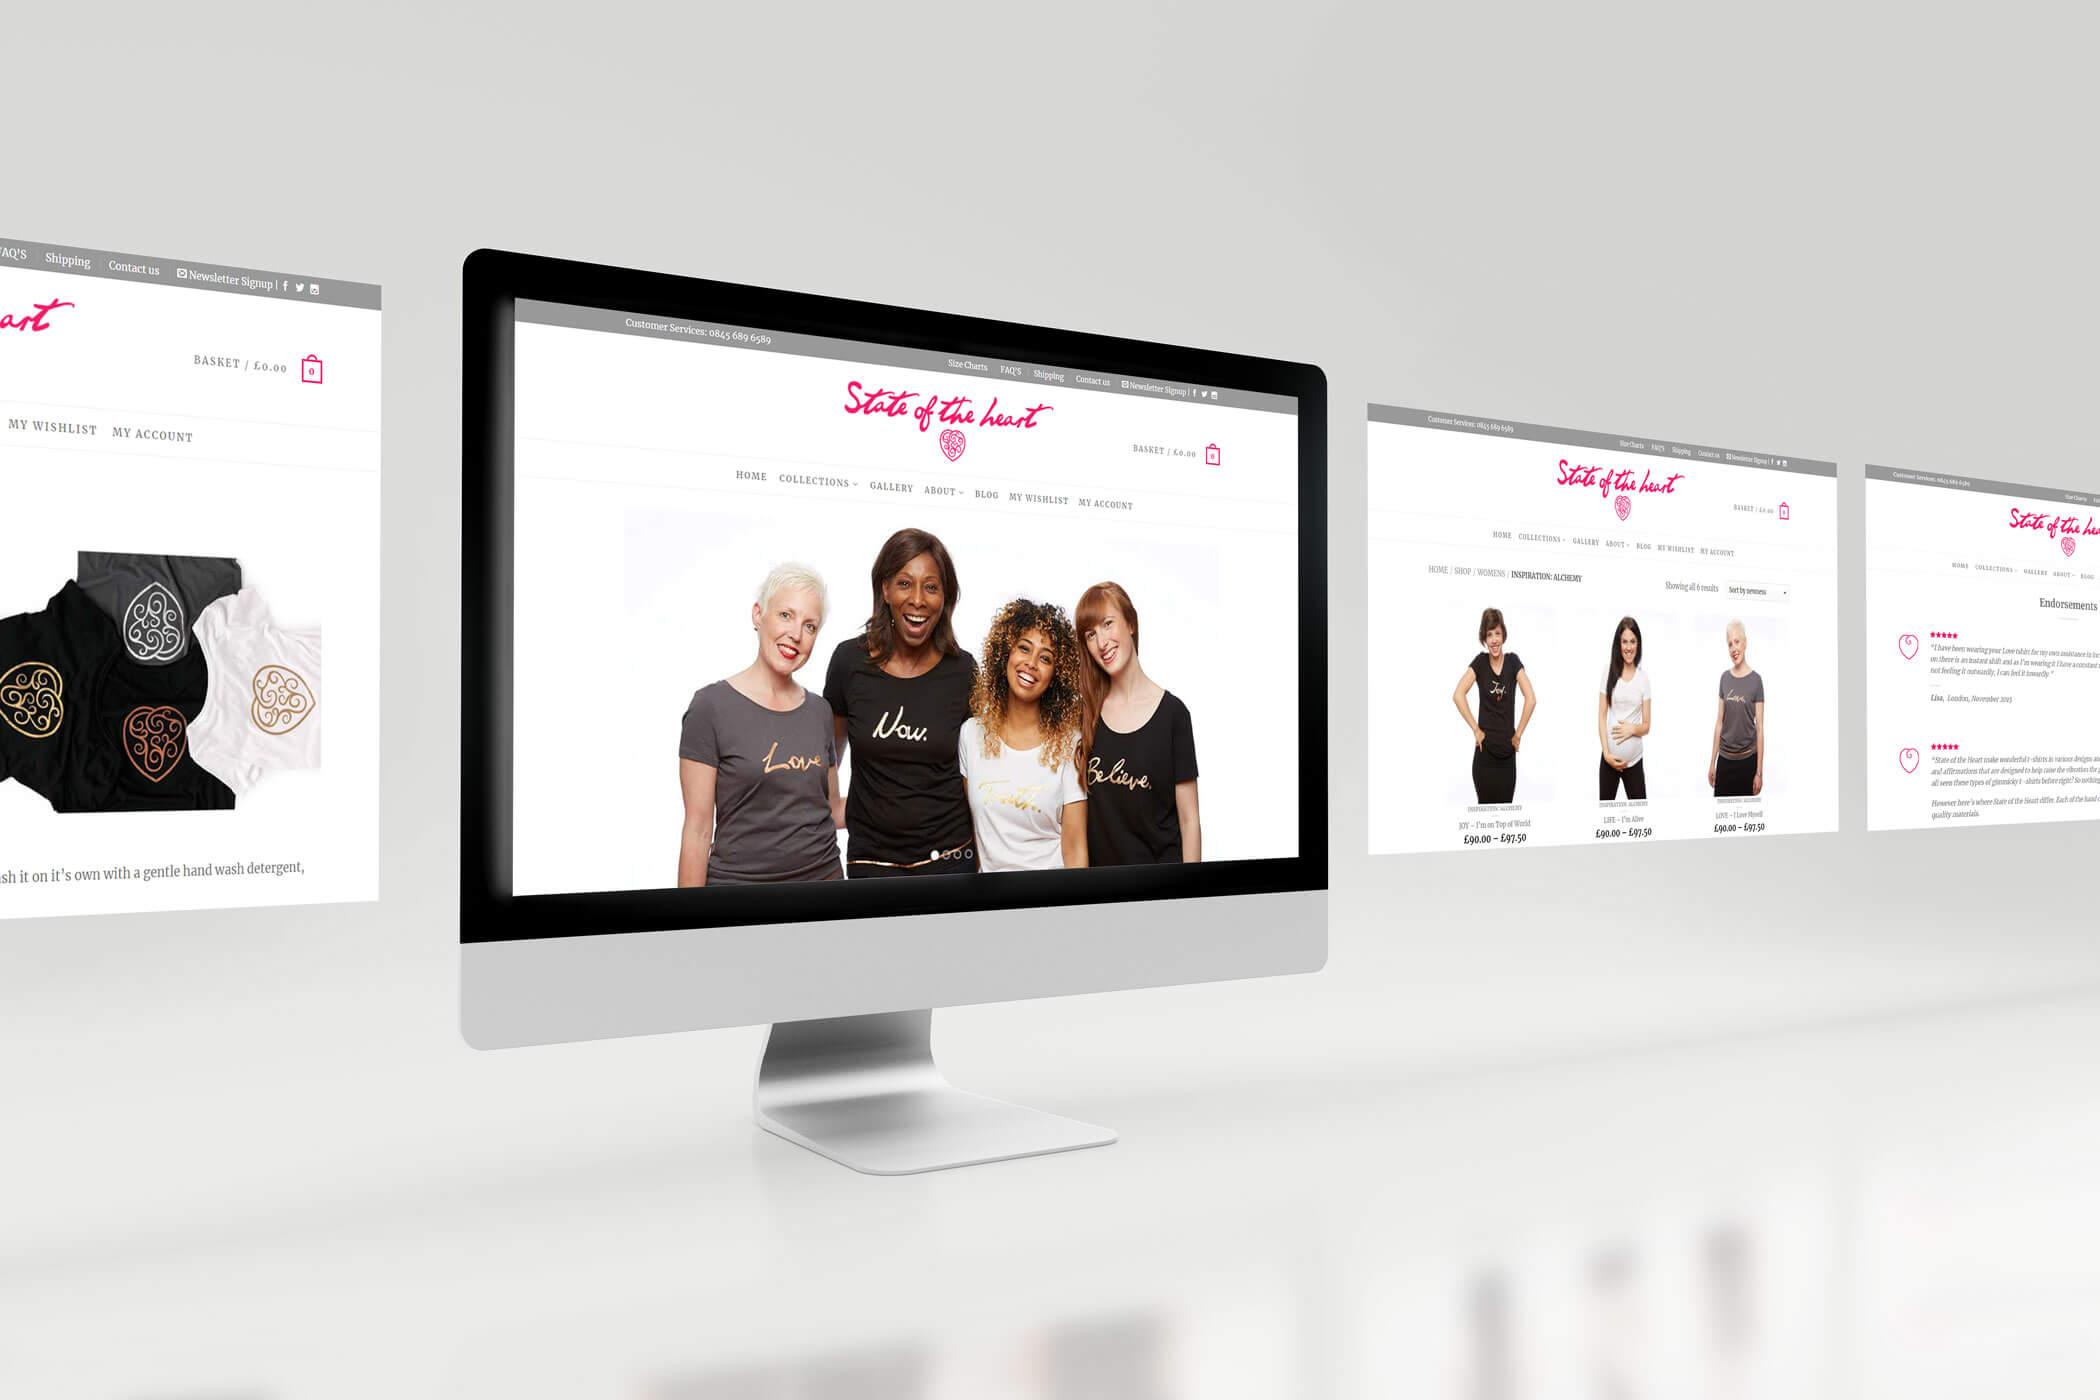 Web Design - Desktop Views for a T Shirt Company